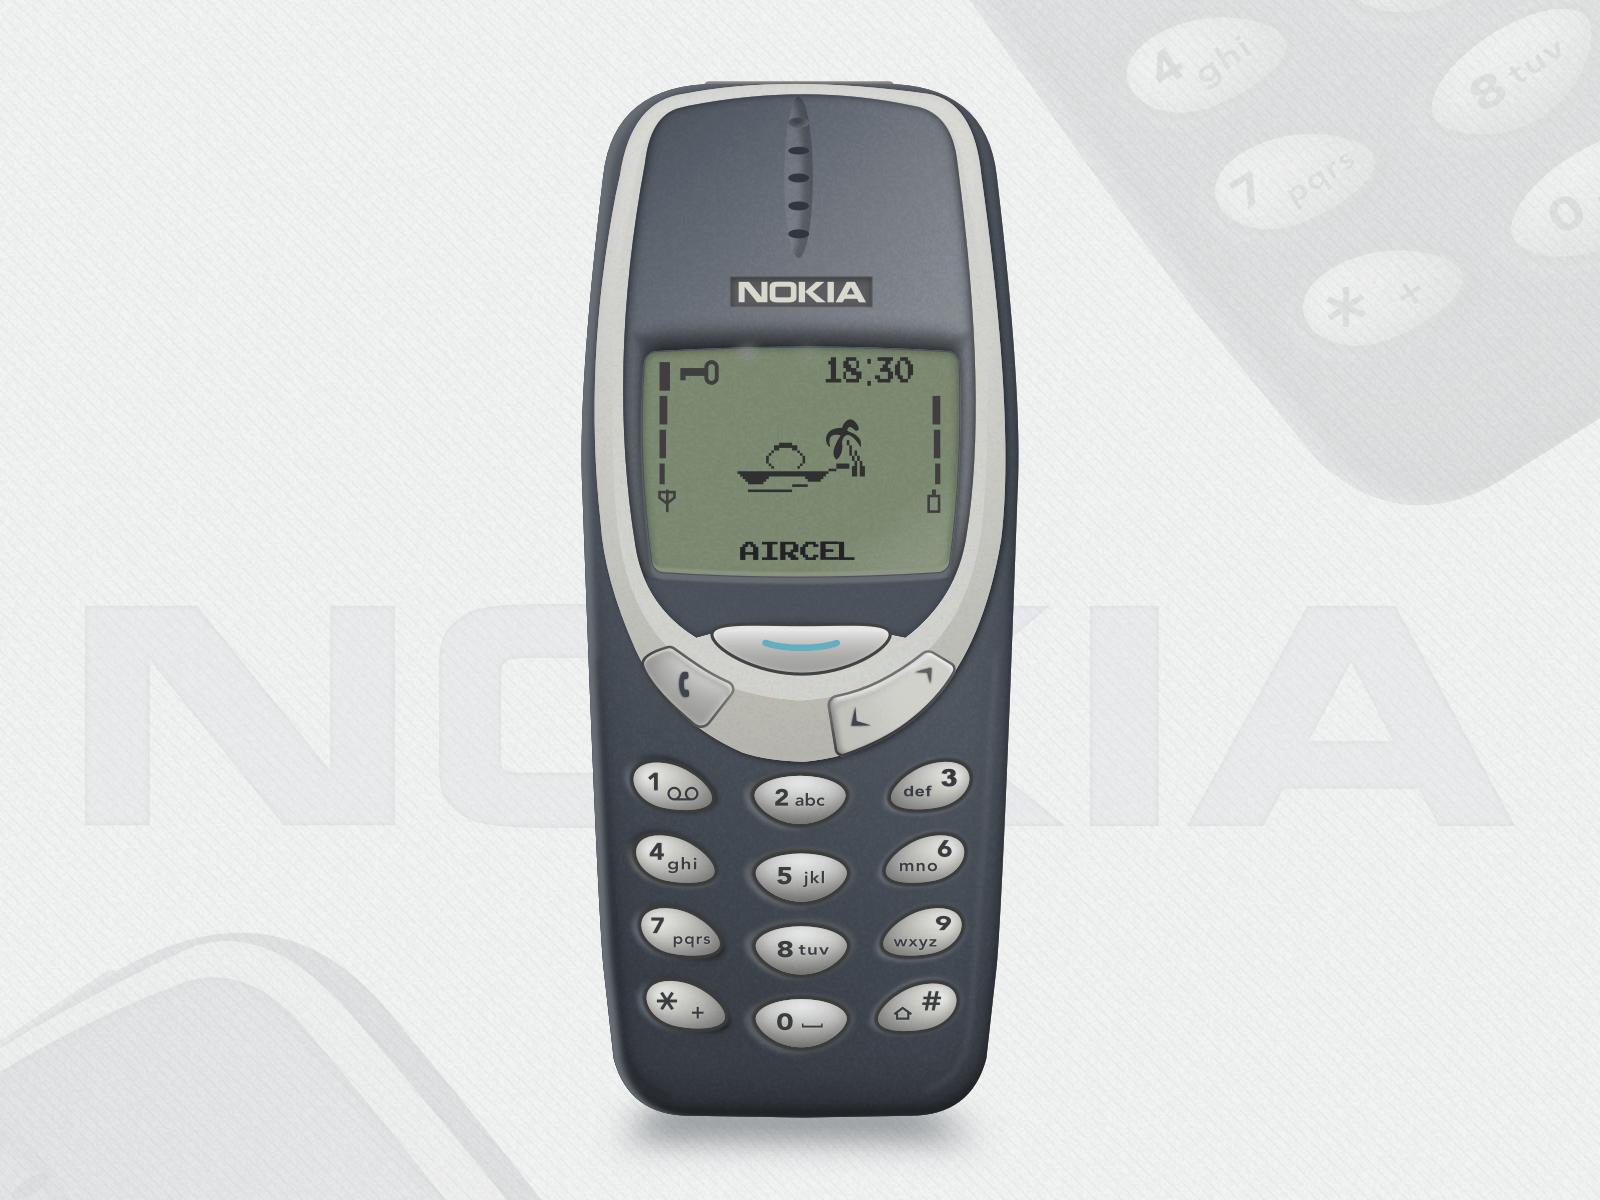 NOKIA 3310 Mockup Sketch freebie - Download free resource for Sketch